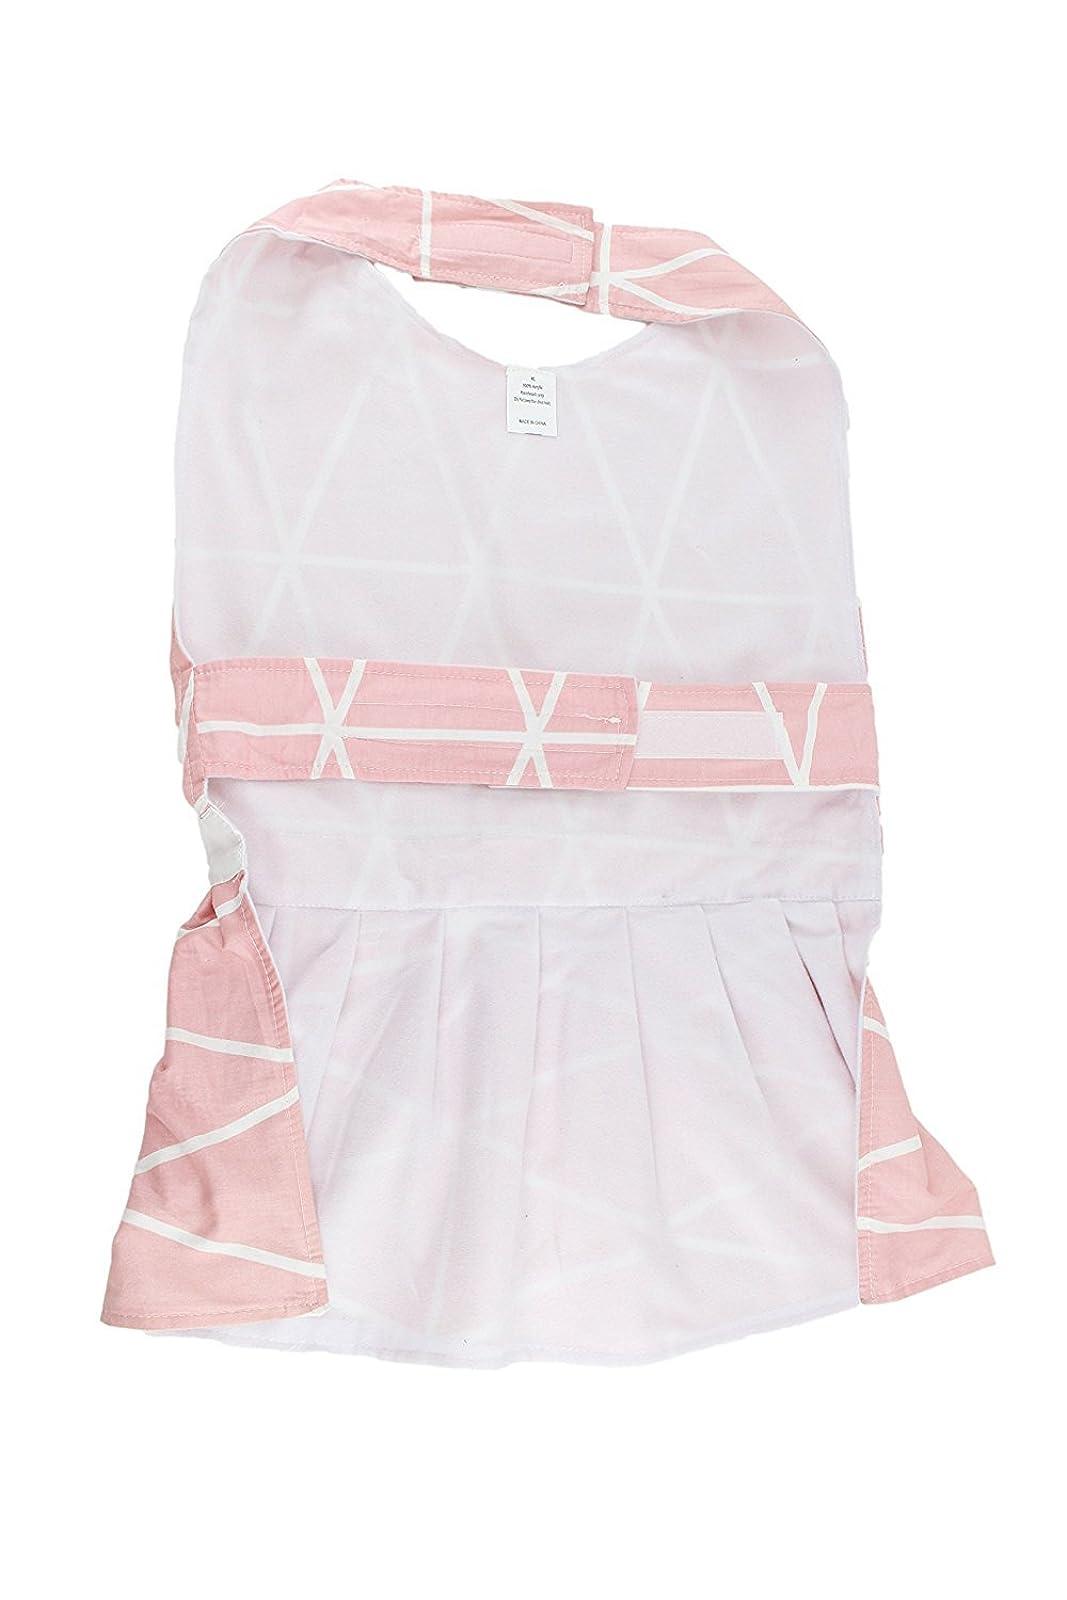 Midlee Pink Geometric Big Dog Dress by (X-Large) XXL - 1